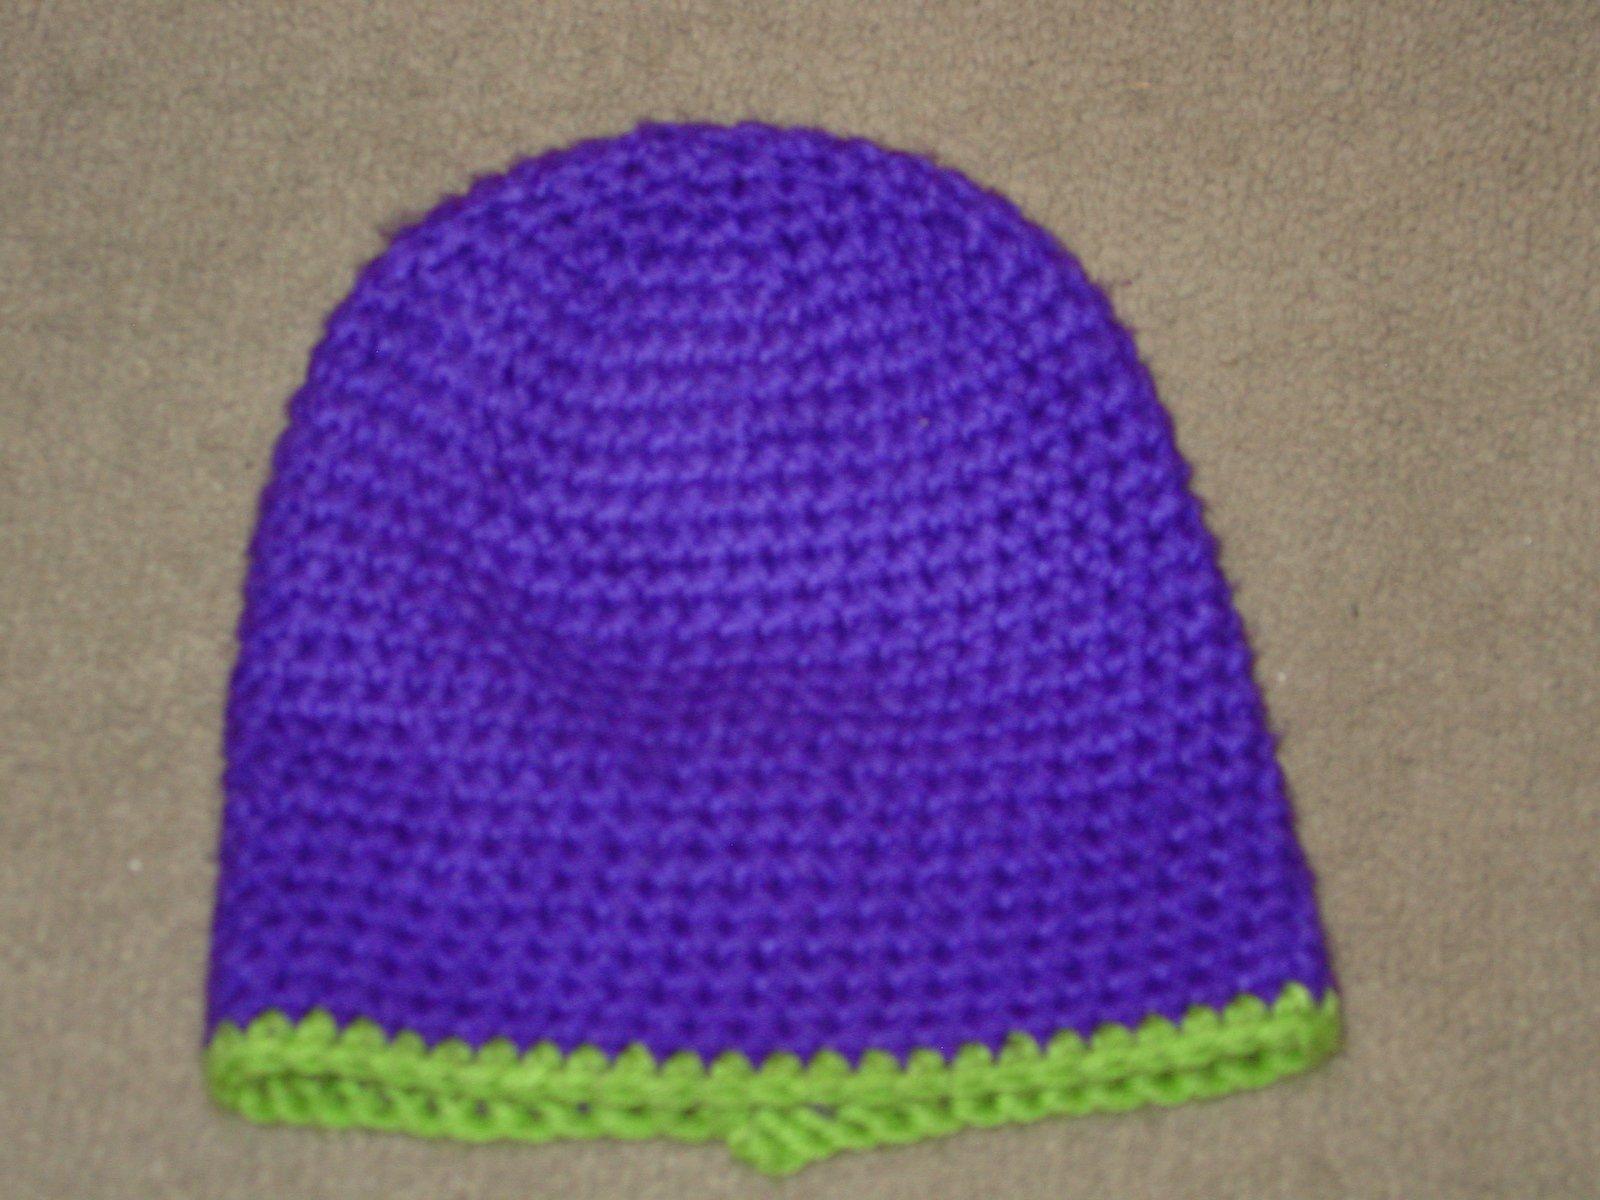 Also pretty old hat